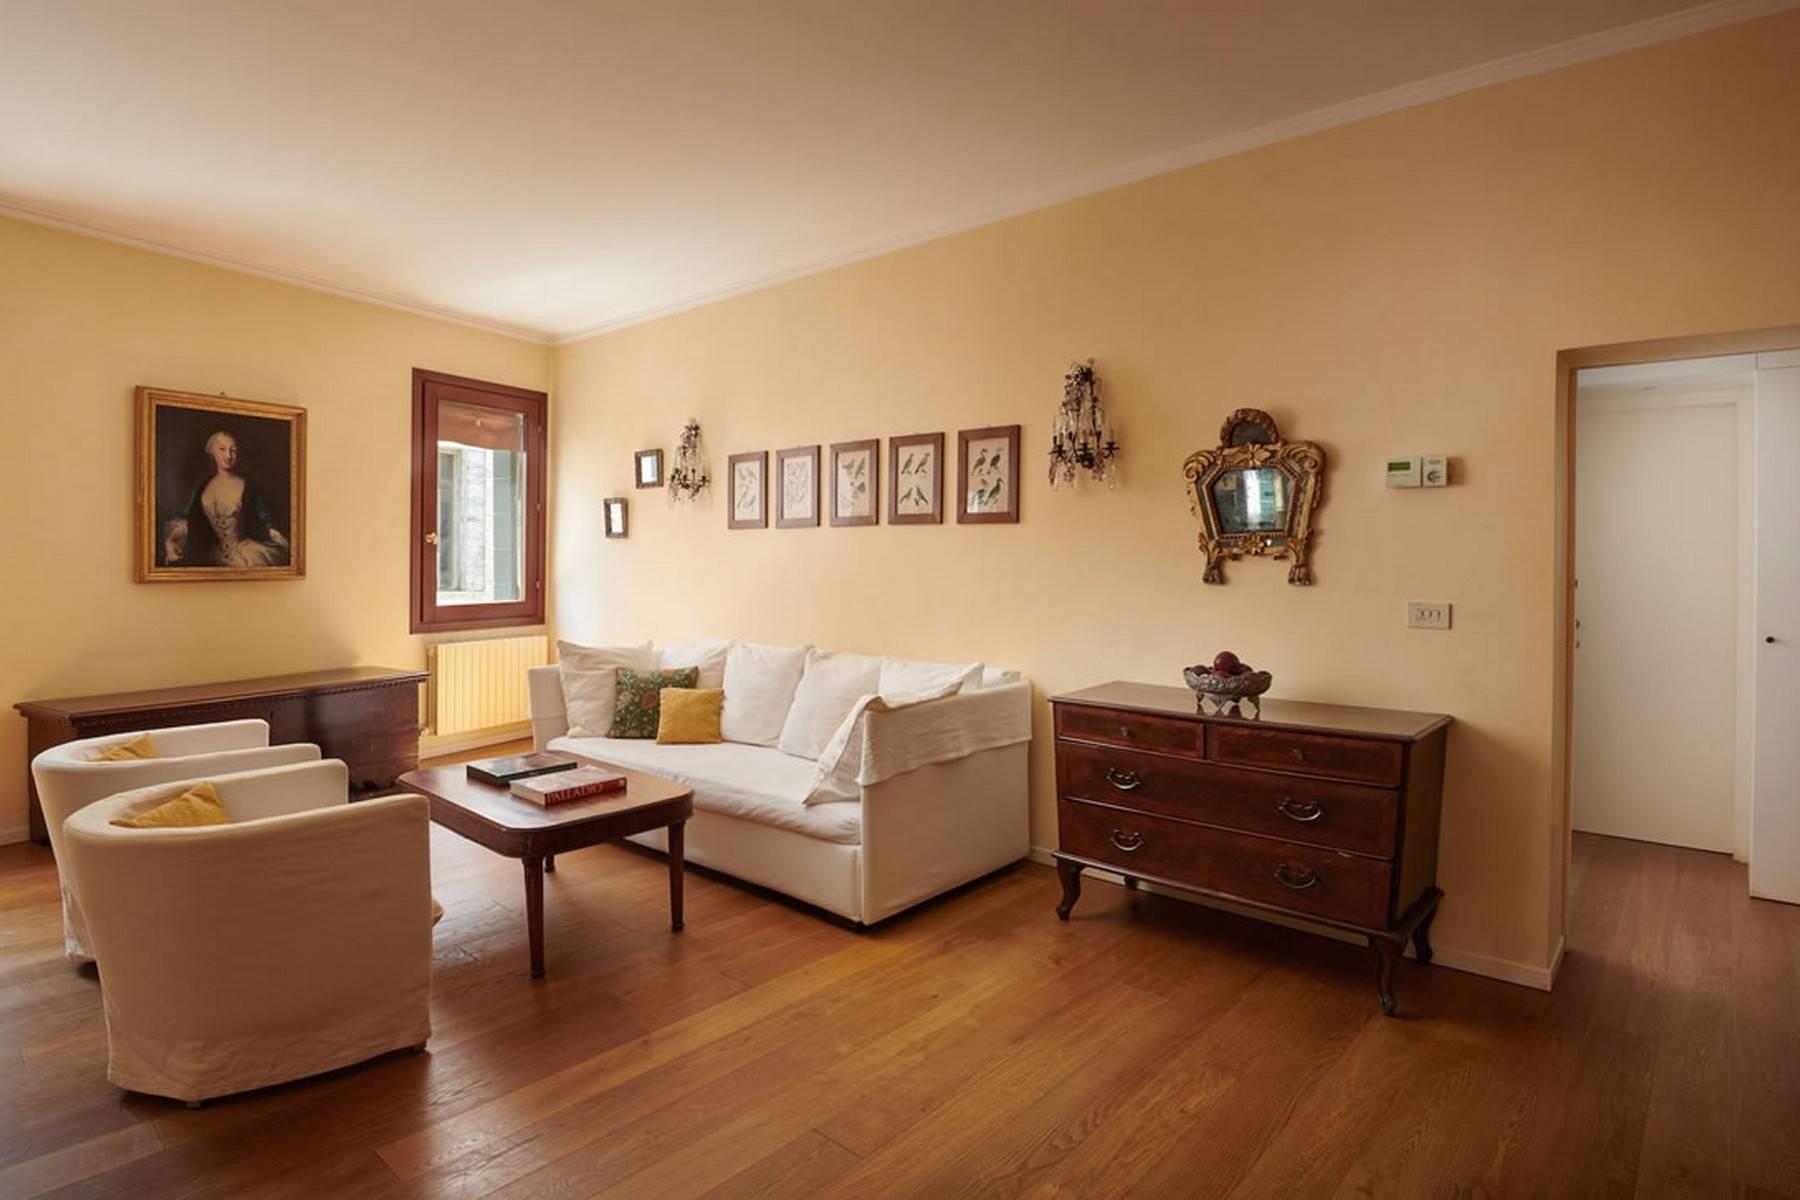 Appartement de design dans le Palazzo Querini Stampalia / S.M. Formosa - 11